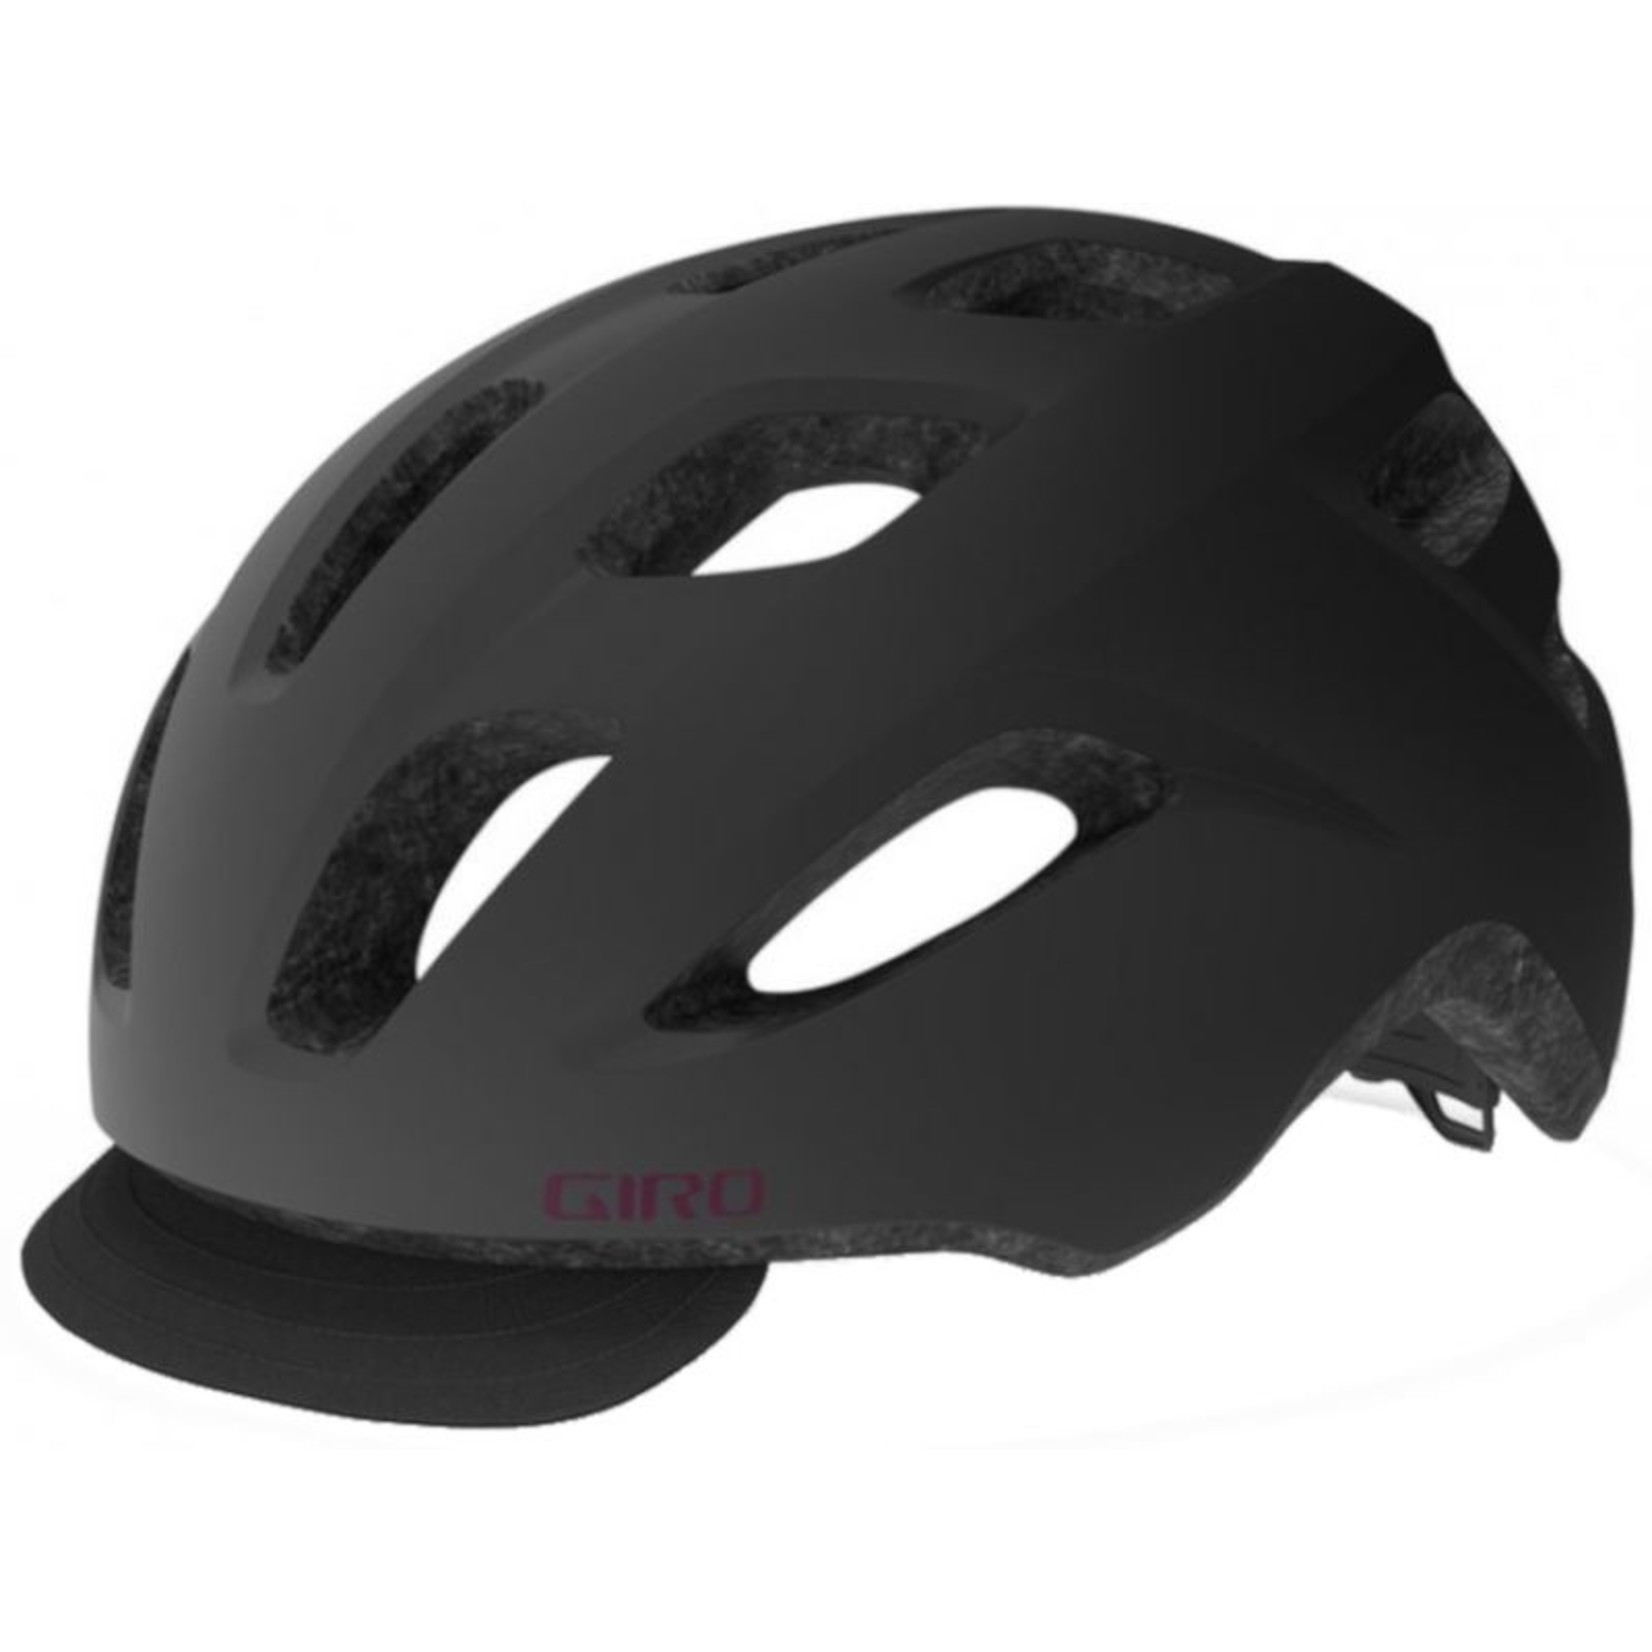 Giro Giro, Helmet Urban Cormick Mips Unisize